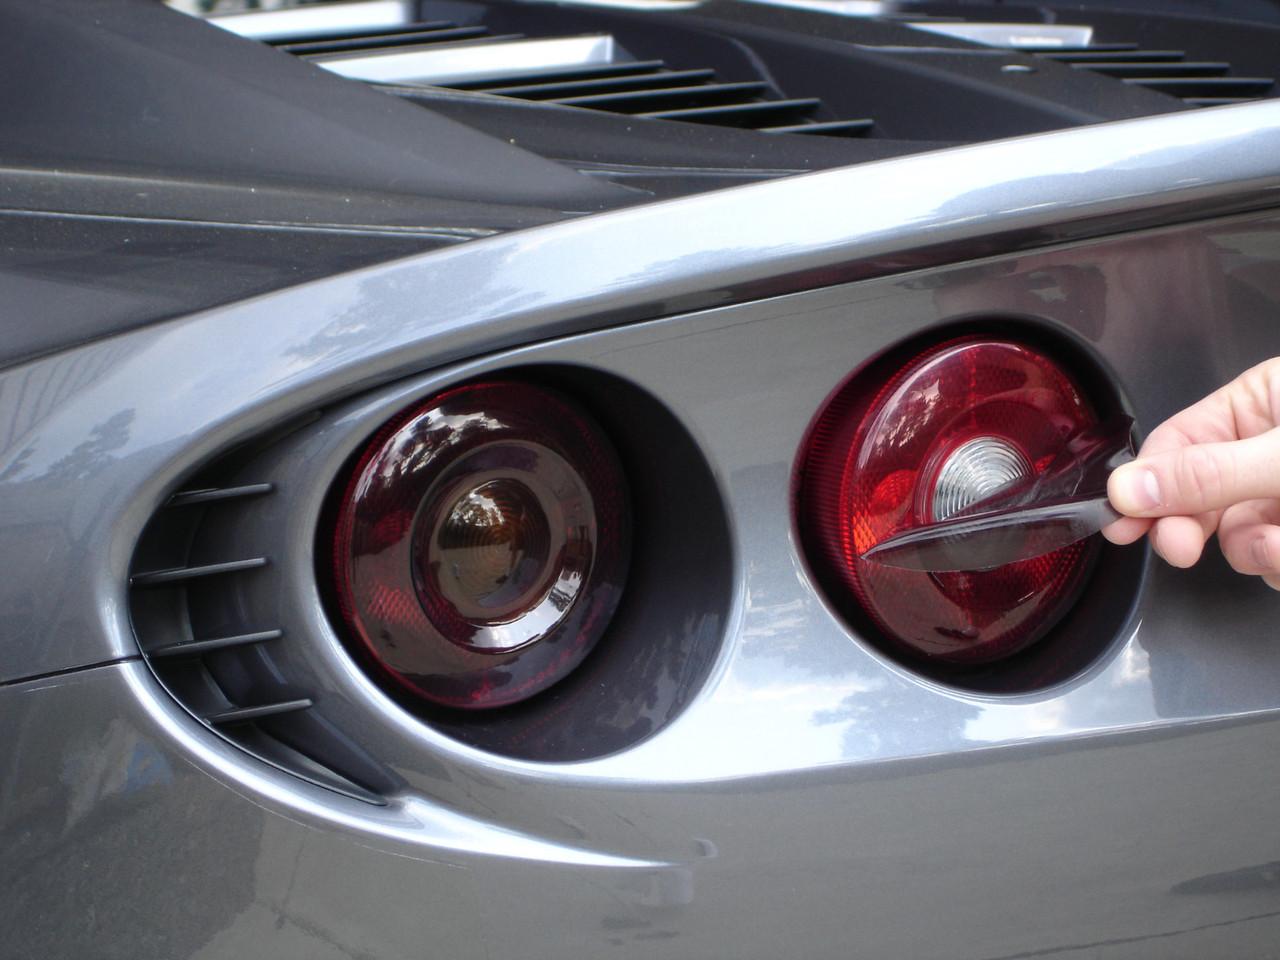 Rtint Tail Light Tint Covers for Chevrolet Silverado 2019-2020 Smoke